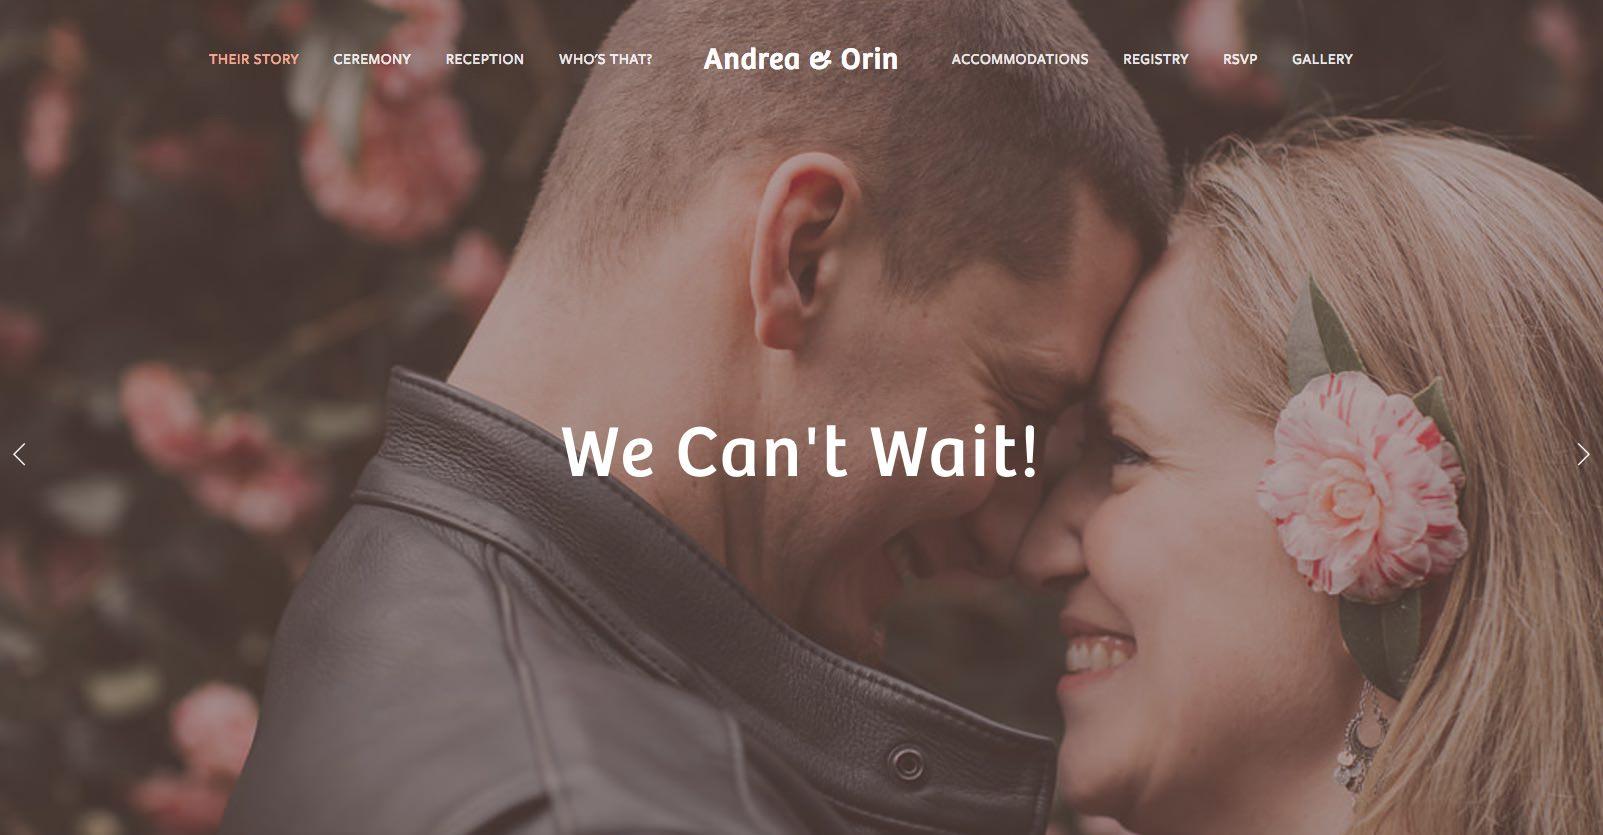 Andrea & Orin Wedding Website — Patey Designs   Purpose